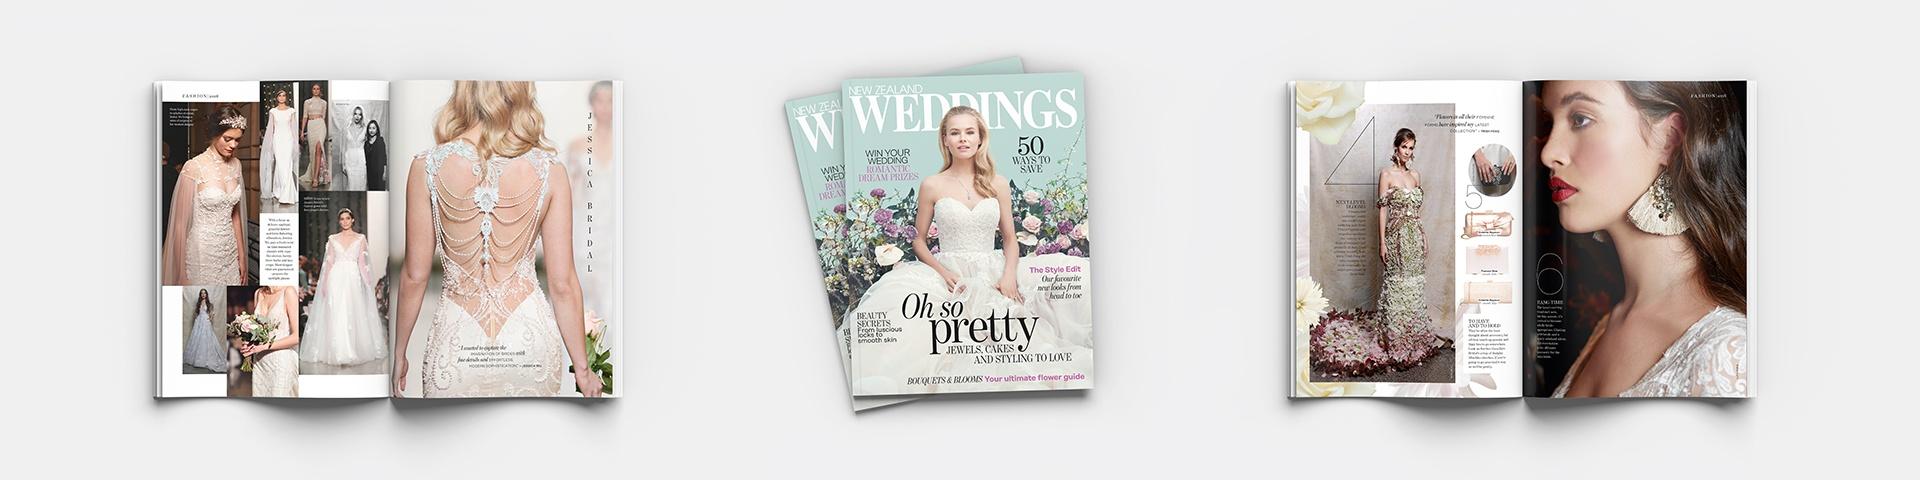 Fashion Week & New Zealand Weddings